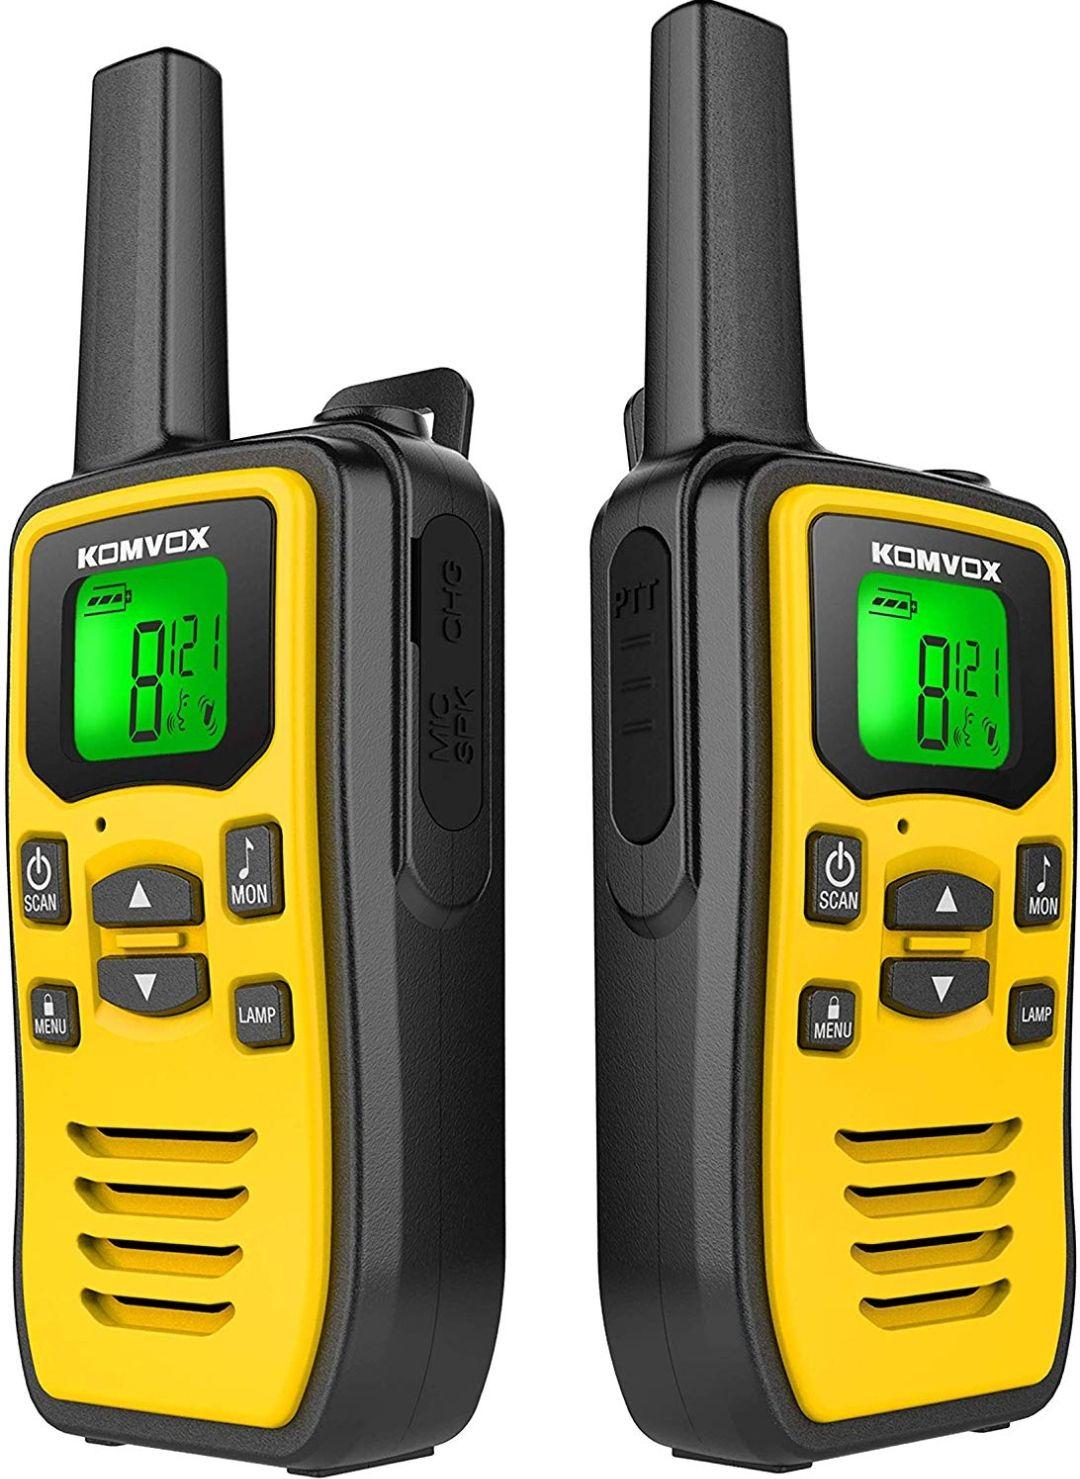 Lot de 2 Talkies-walkies rechargeables Komvox (Vendeur tiers)